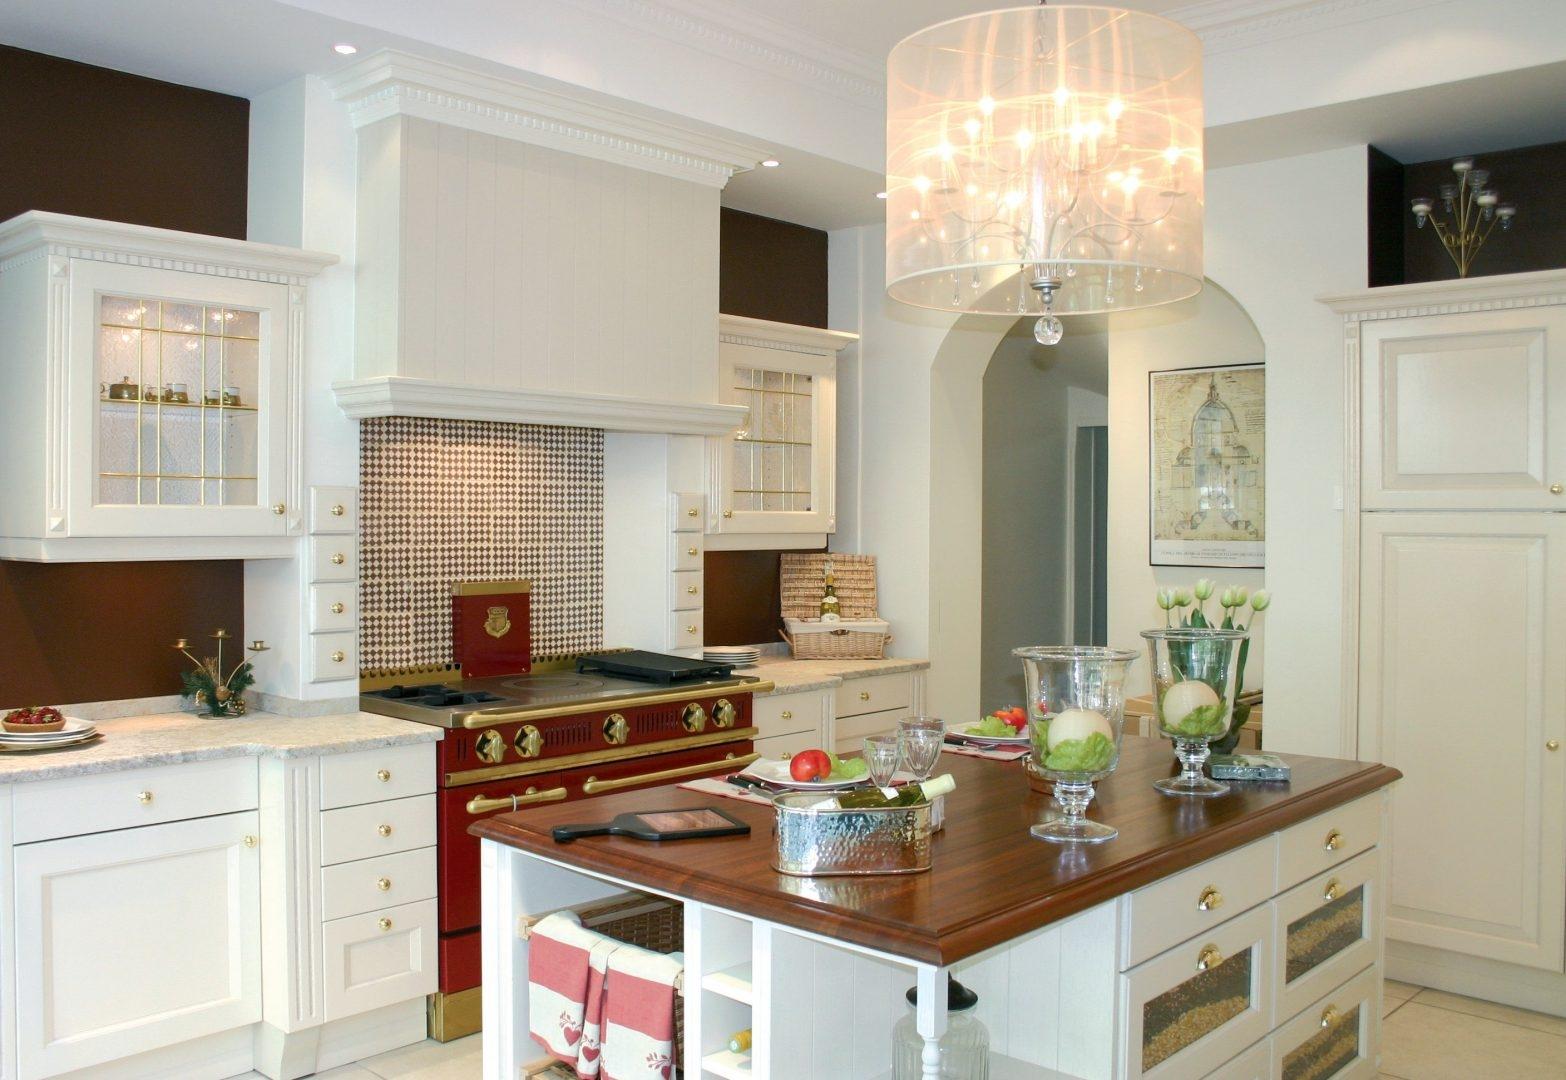 Cocinas rusticas modernas isla central madera cocina roja - Muebles de cocina con isla central ...